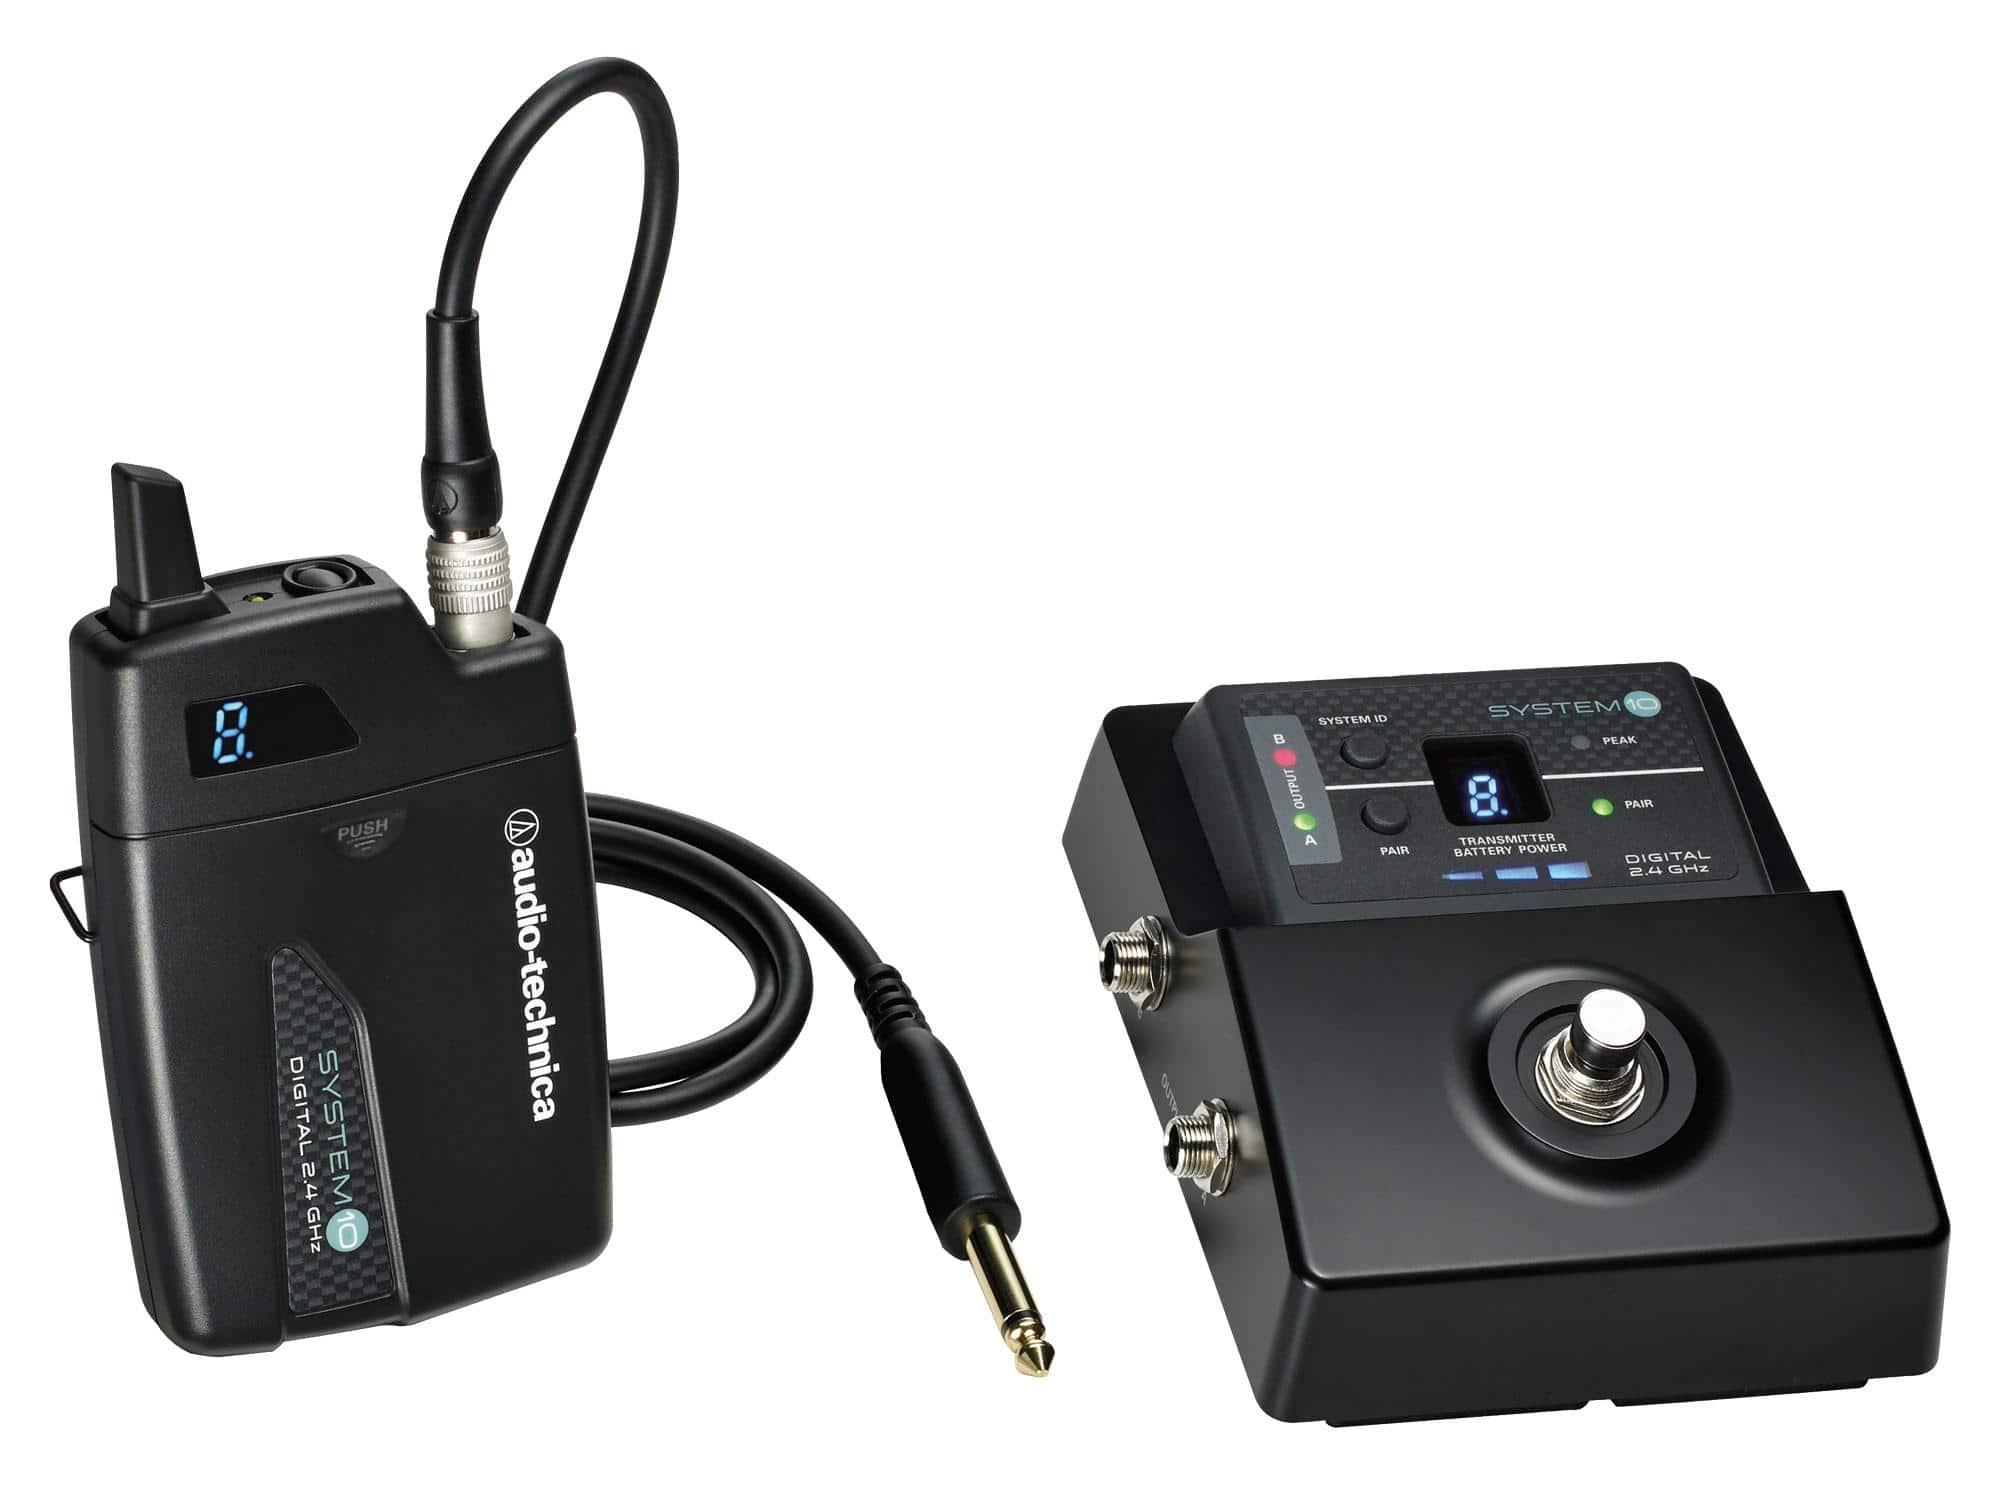 Audio Technica ATW 1501 Bodypack Stomp Funkset